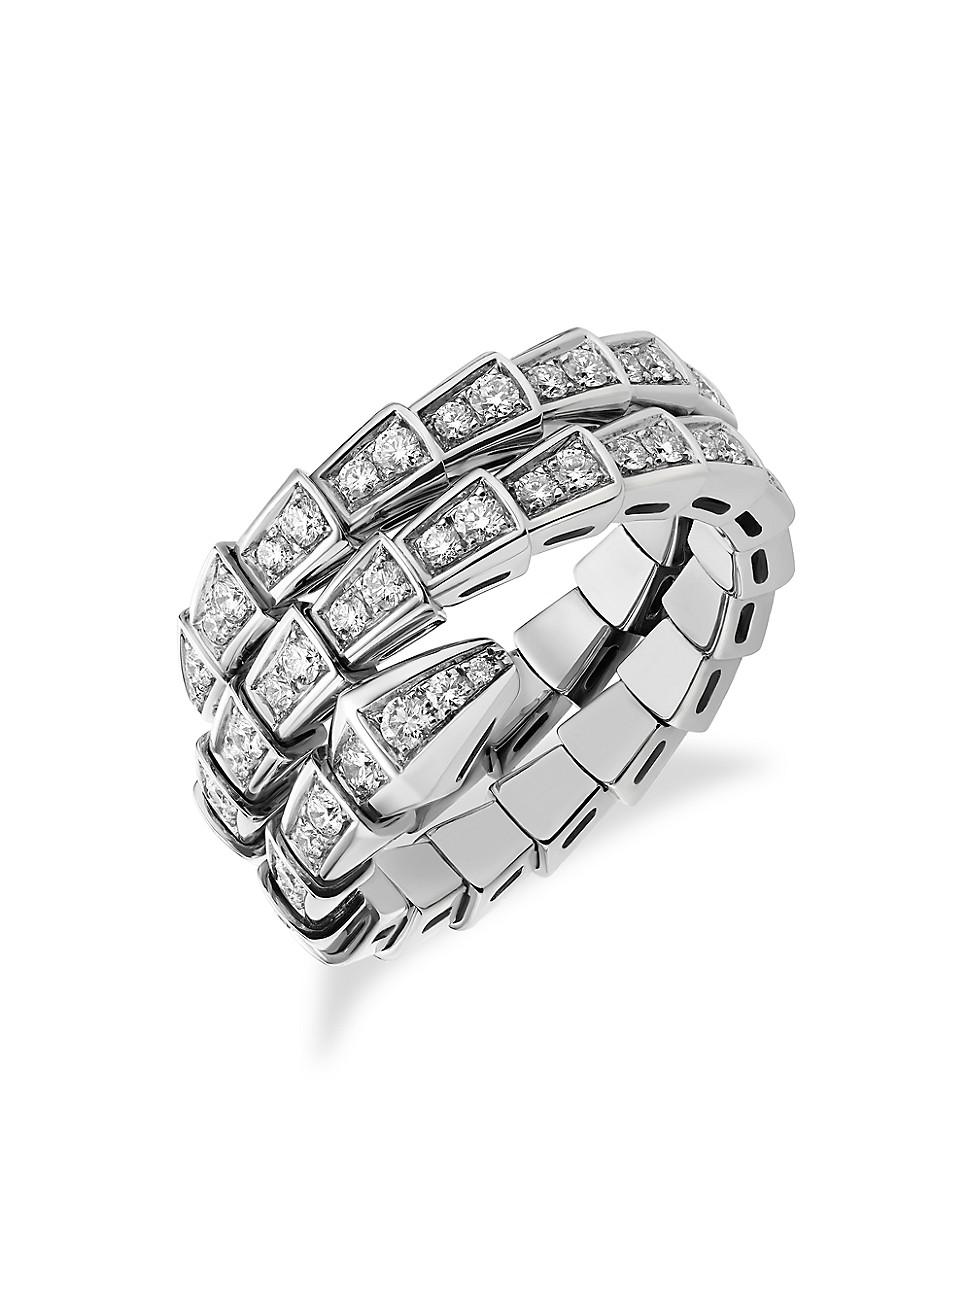 Bvlgari Rings WOMEN'S SERPENTI VIPER 18K WHITE GOLD & PAVÉ DIAMOND 2-COIL RING